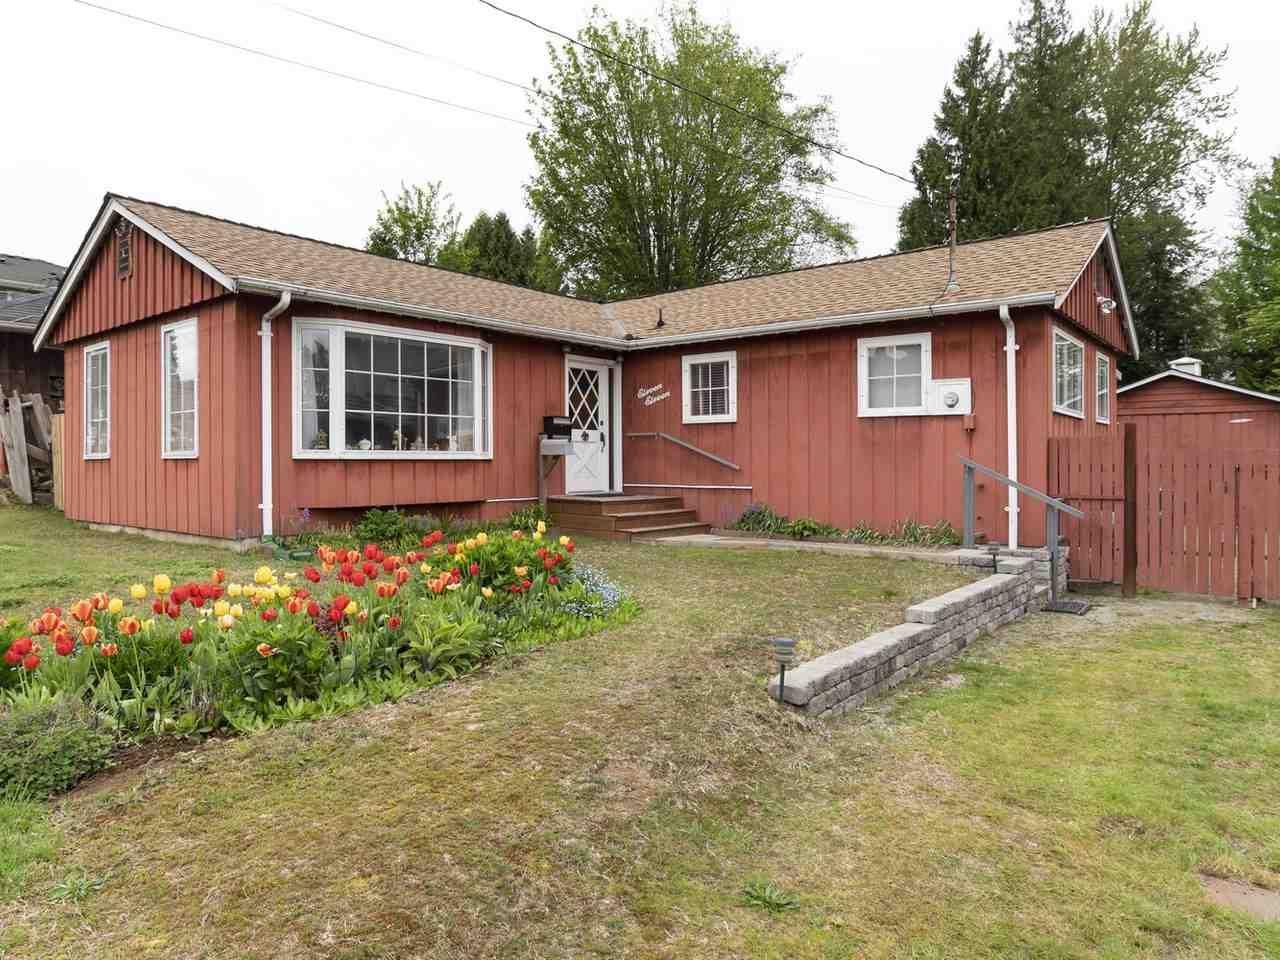 Main Photo: 1111 REGAN Avenue in Coquitlam: Central Coquitlam House for sale : MLS®# R2452577